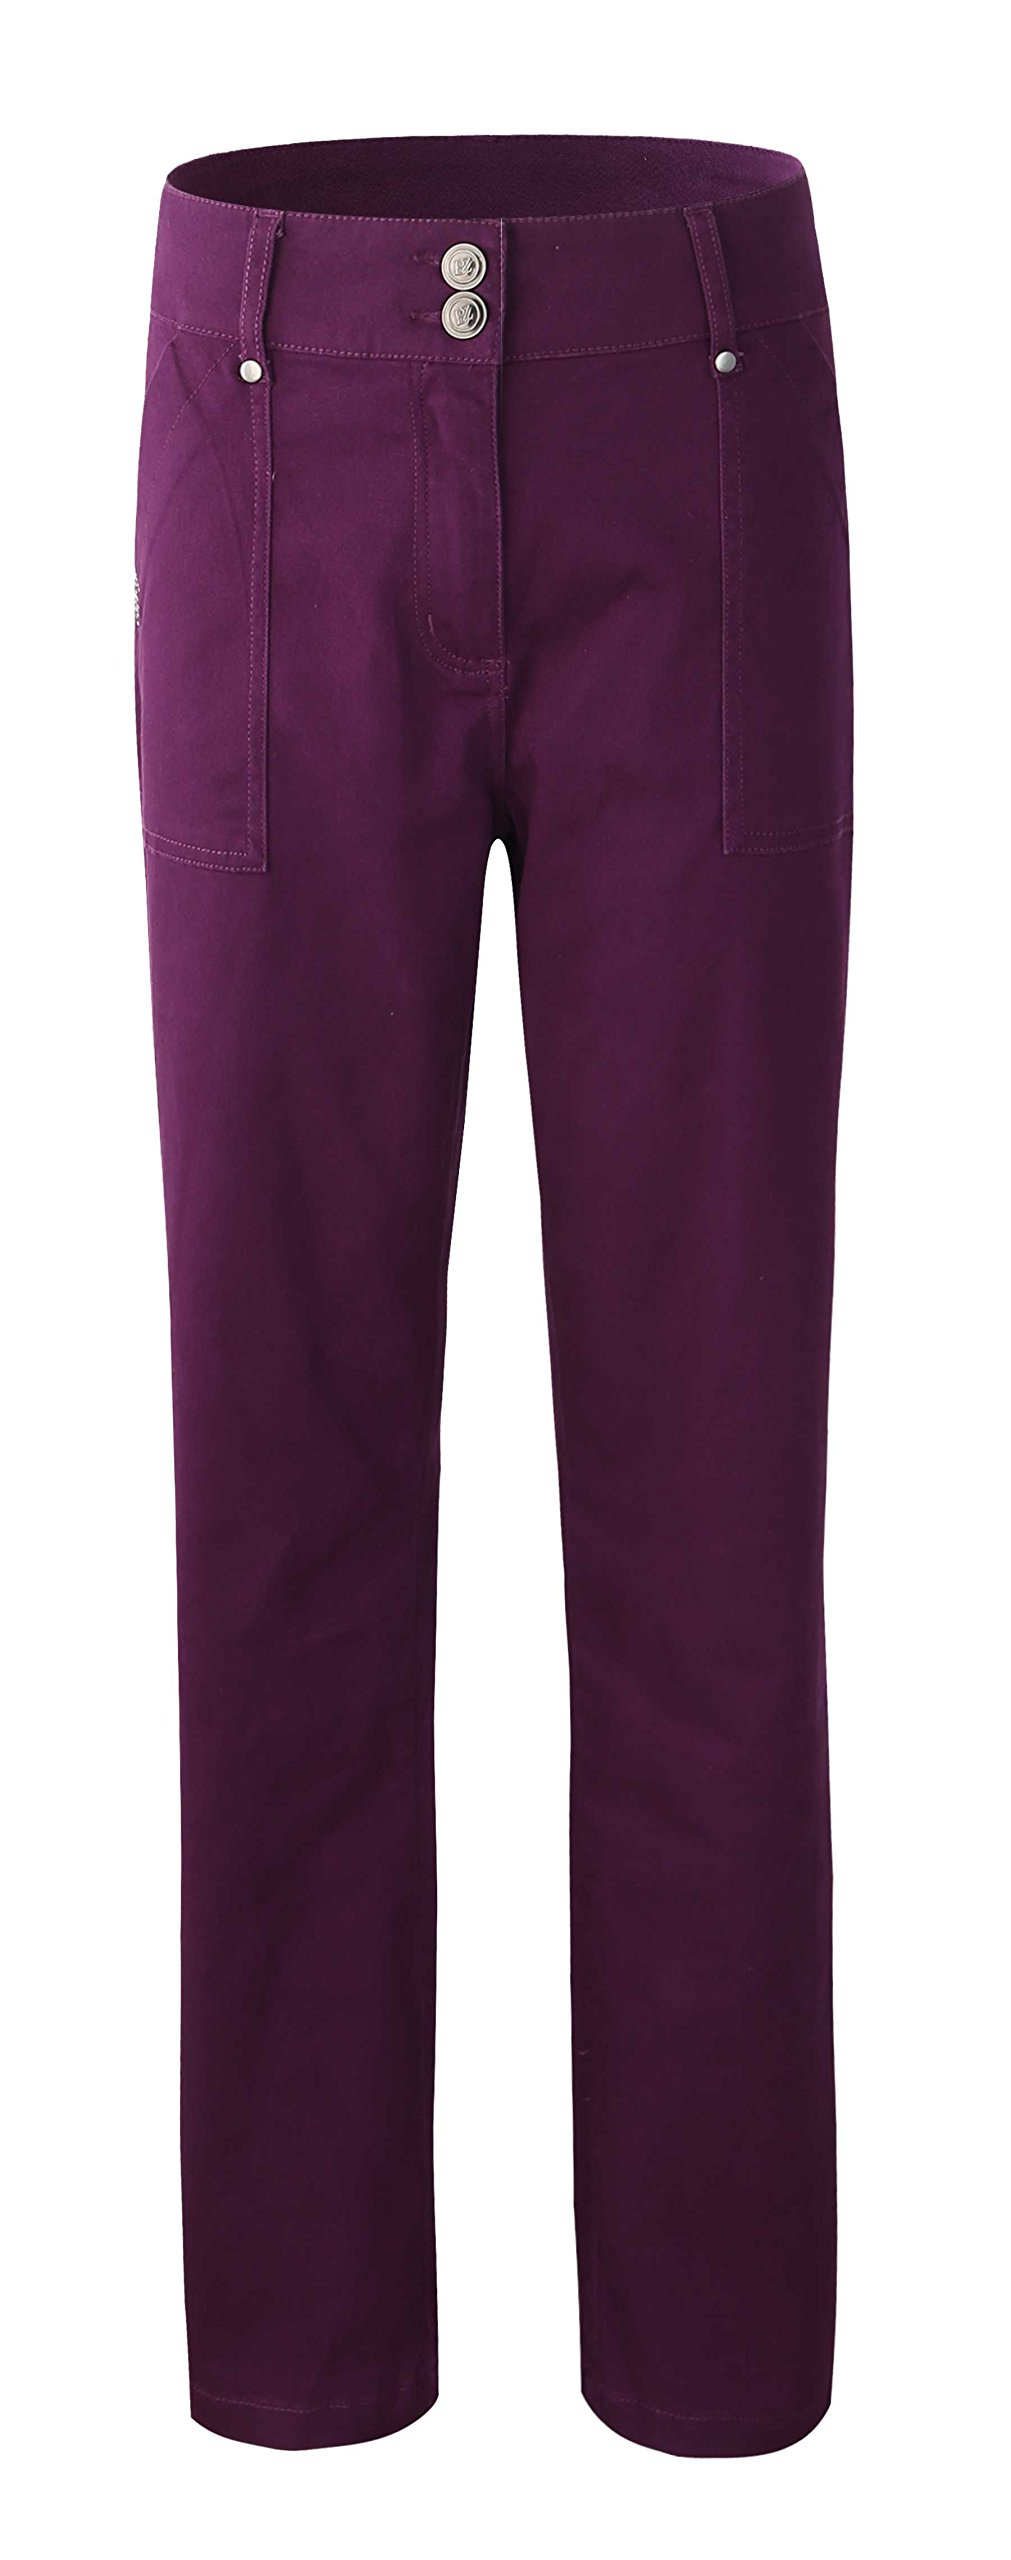 Bienzoe Women's Fashion Causal Twill Stretch Straight-Leg Pants Purple Size 12